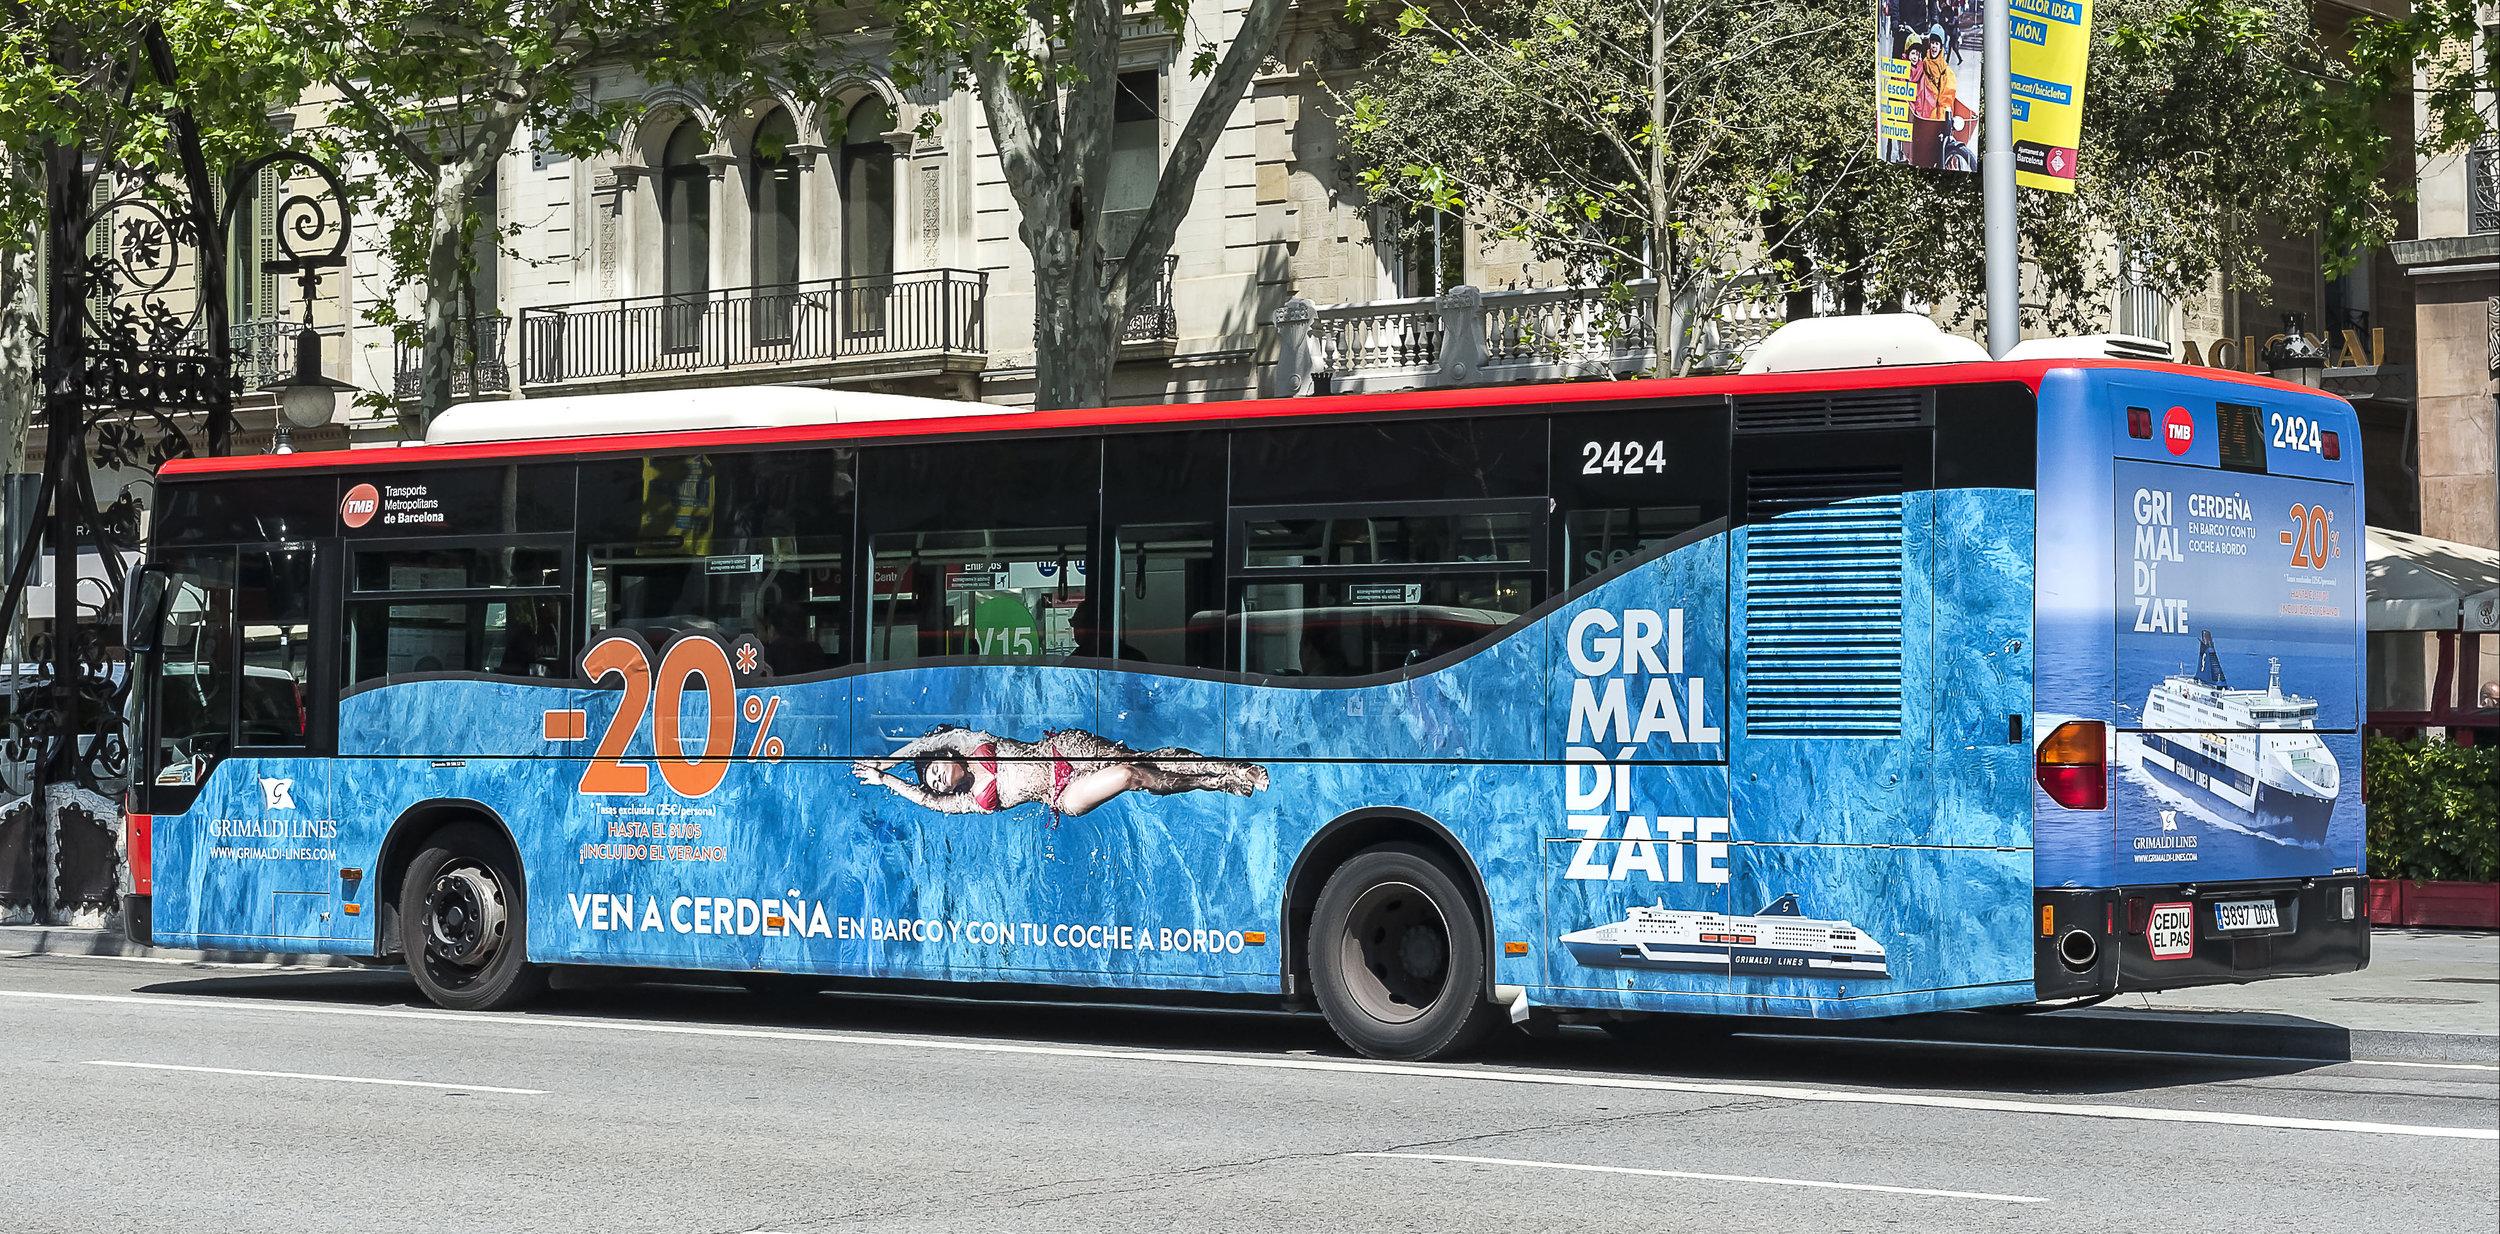 GRIMALDI BUS - 2424 (1).jpg